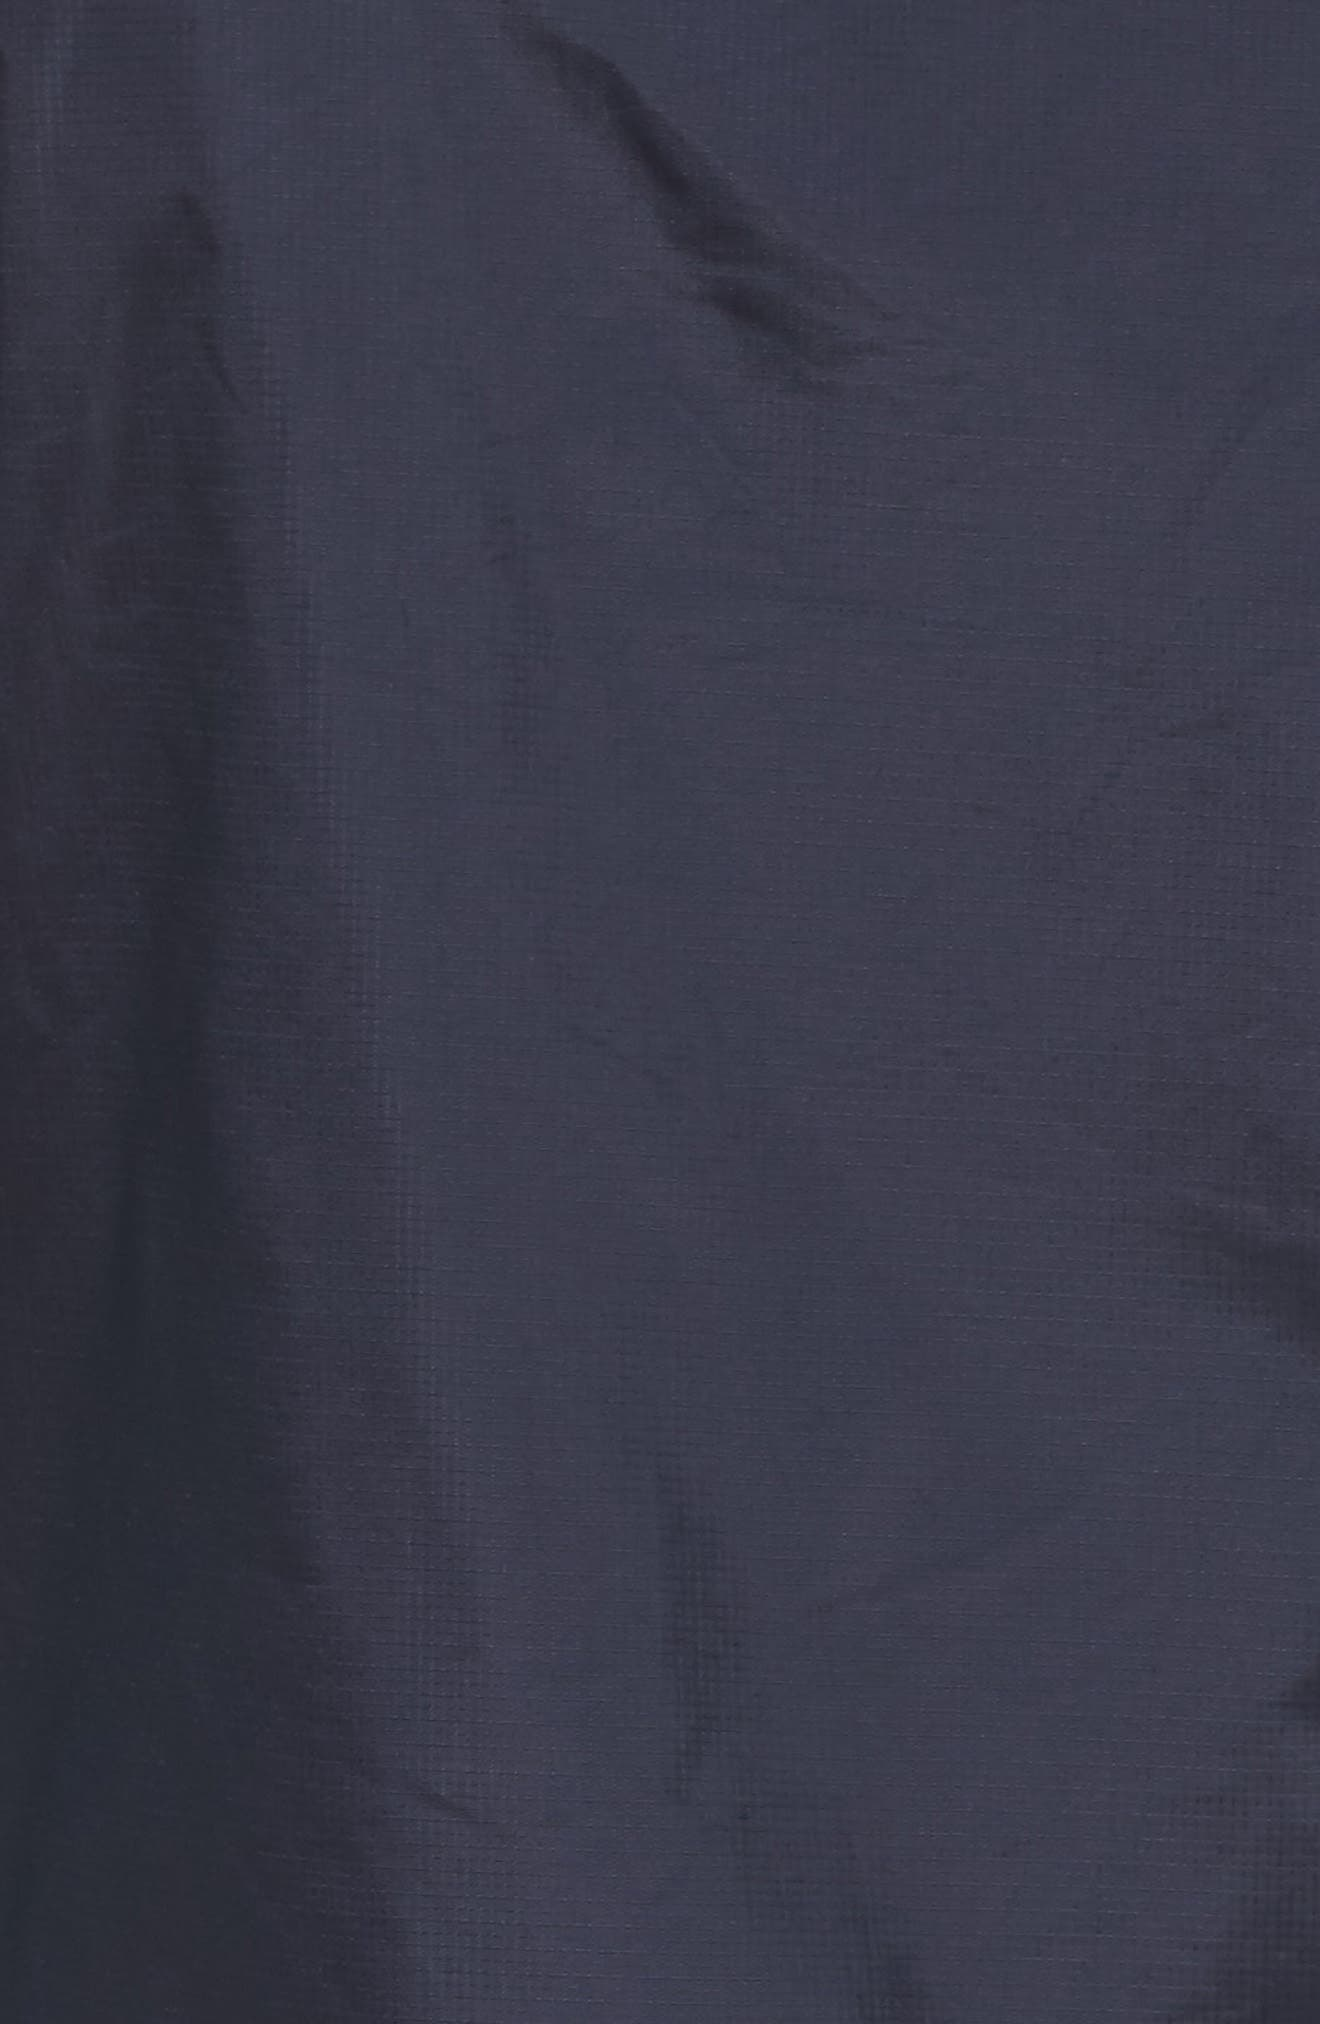 Torrentshell Jacket,                             Alternate thumbnail 6, color,                             Navy Blue/ Strait Blue